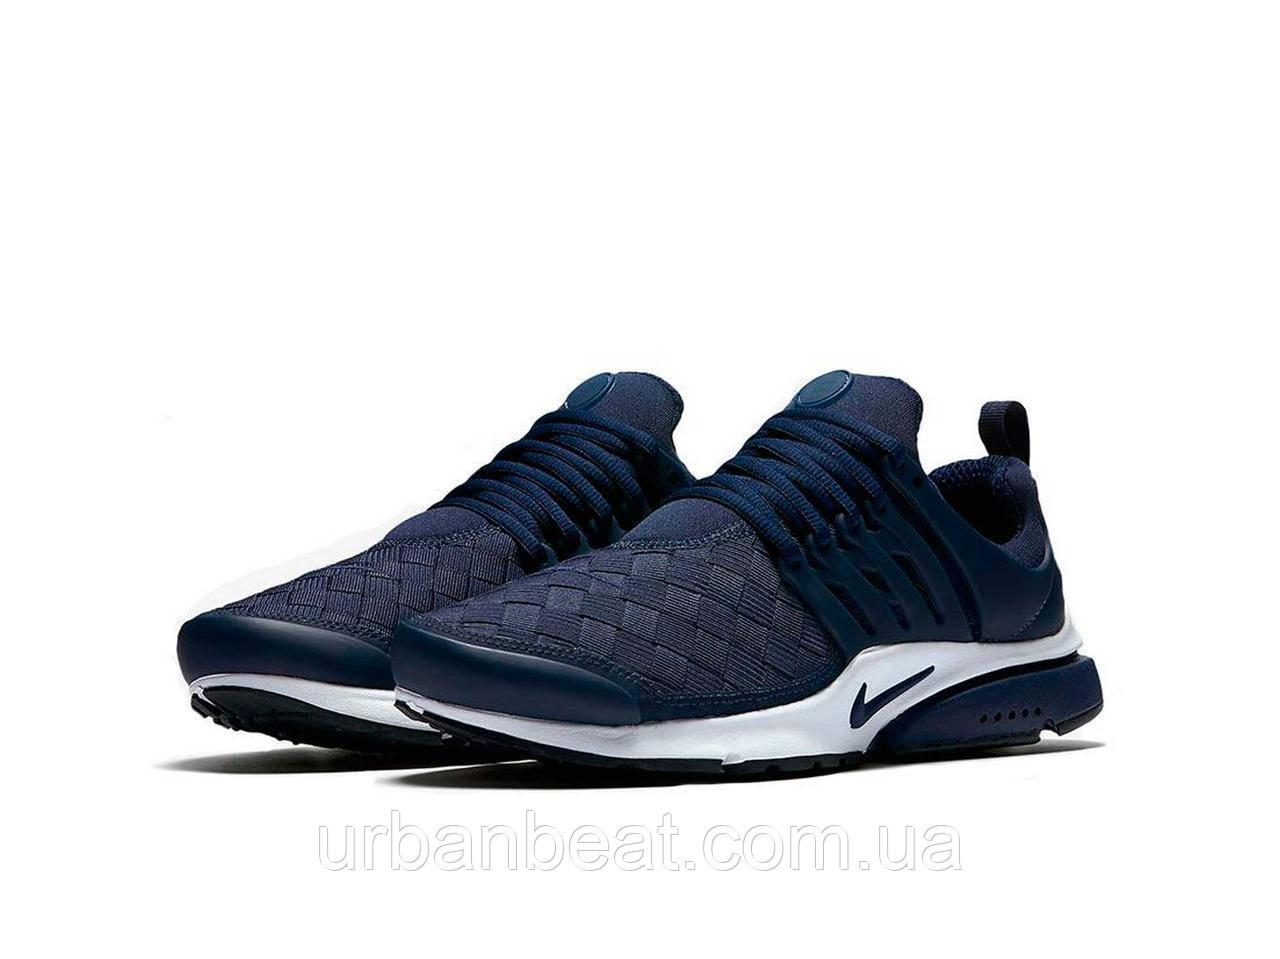 bdad6c095aa9 Мужские Кроссовки Nike Air Presto SE Blue РЕПЛИКА ААА — в Категории